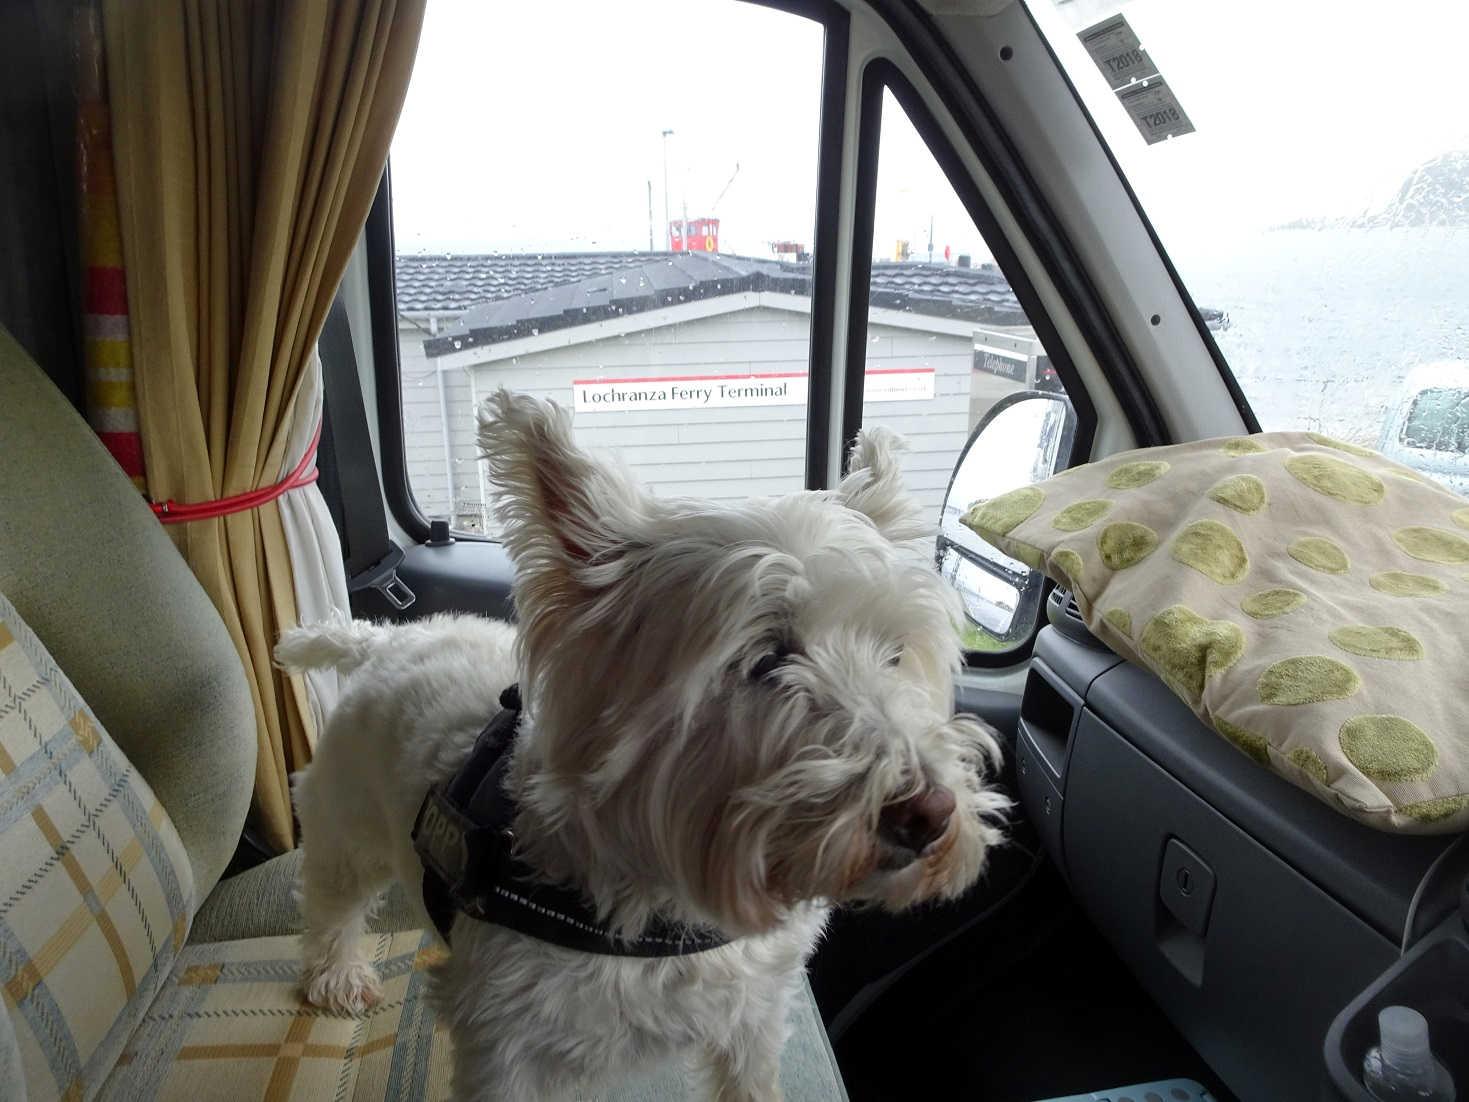 poppy the westie back at the Lochranza ferry terminal